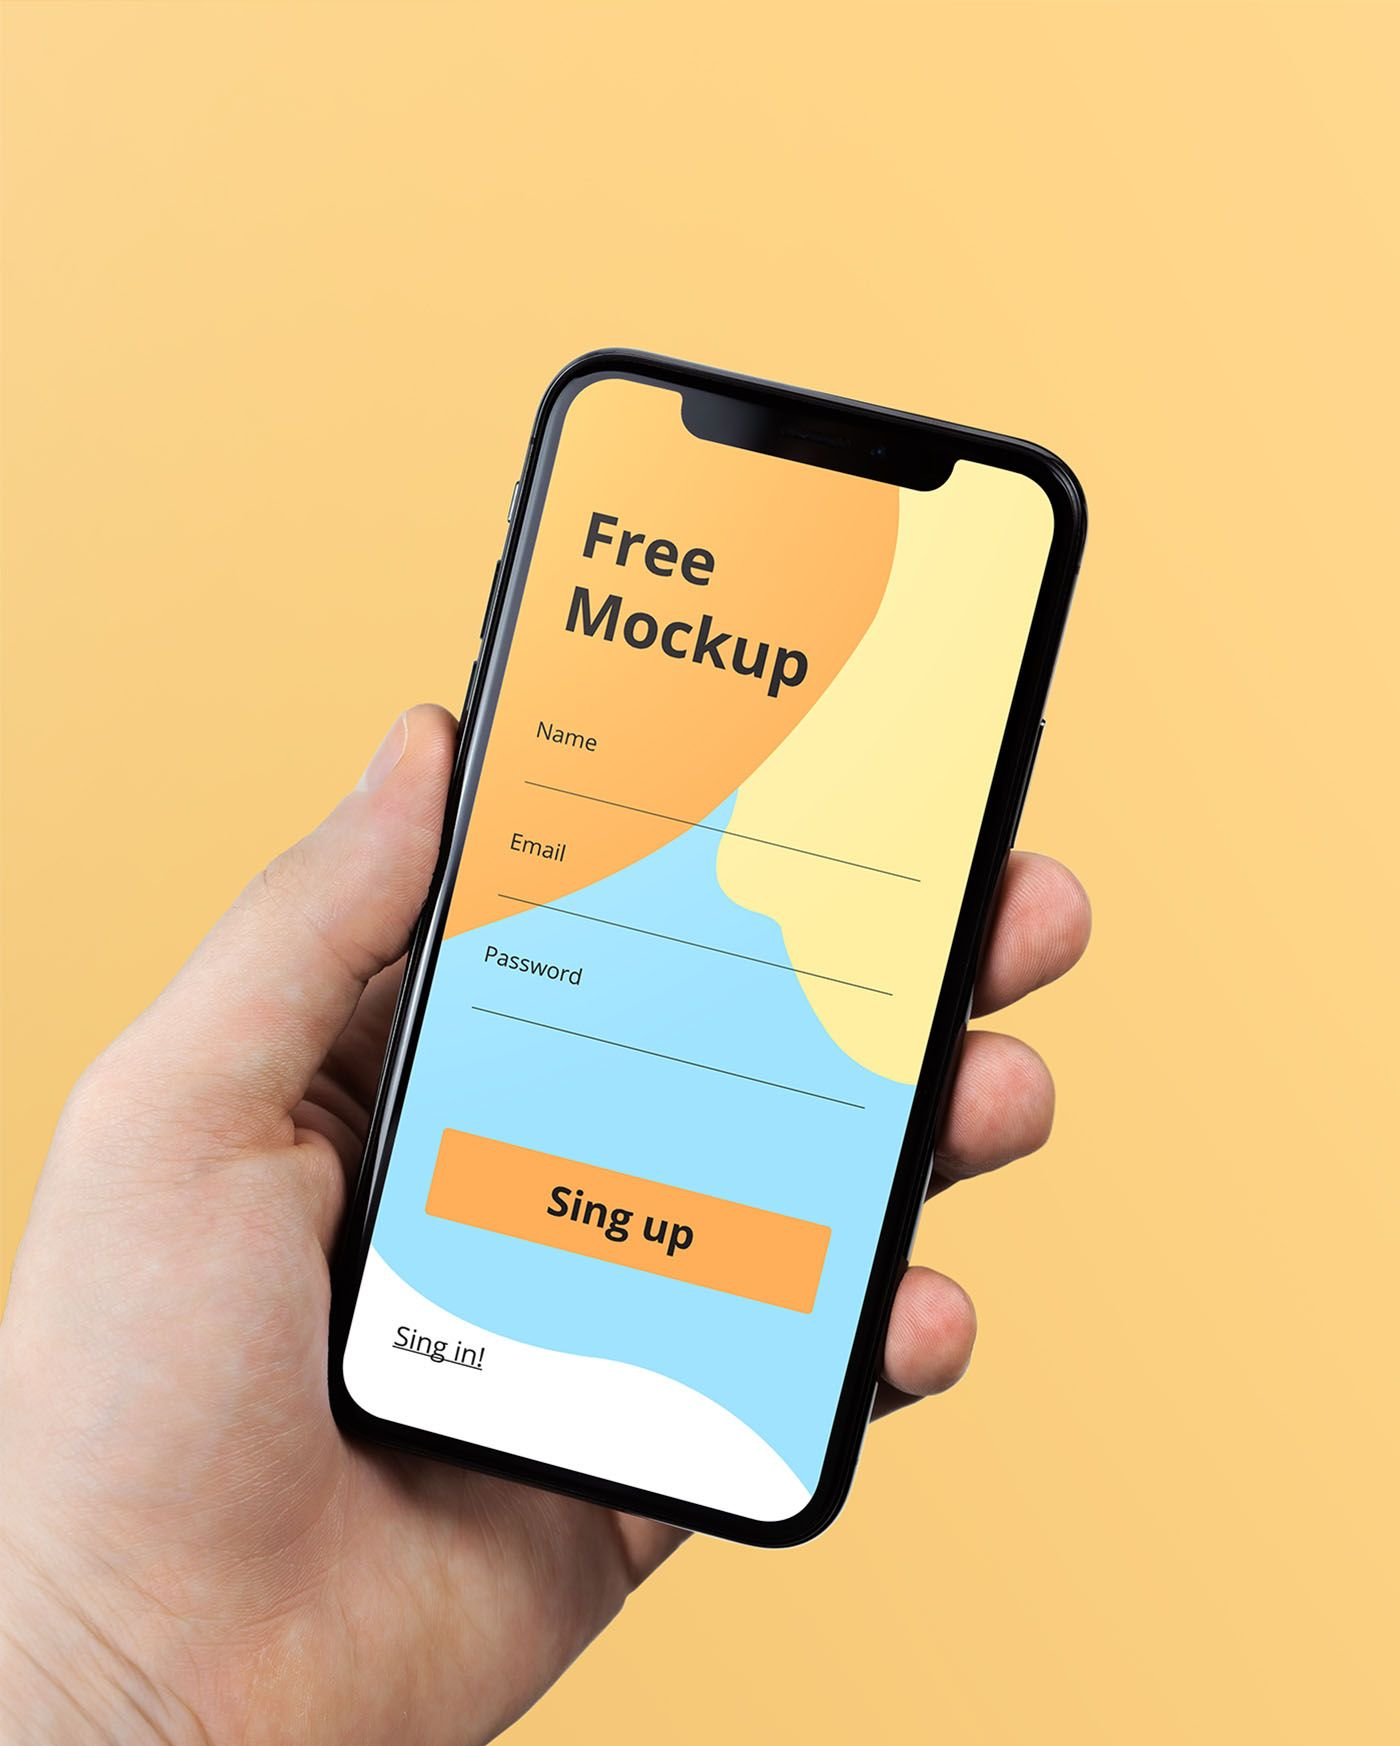 Download Iphone X In Hand Free Psd Mockup Midias Sociais Fontes Gratuitas Mockup